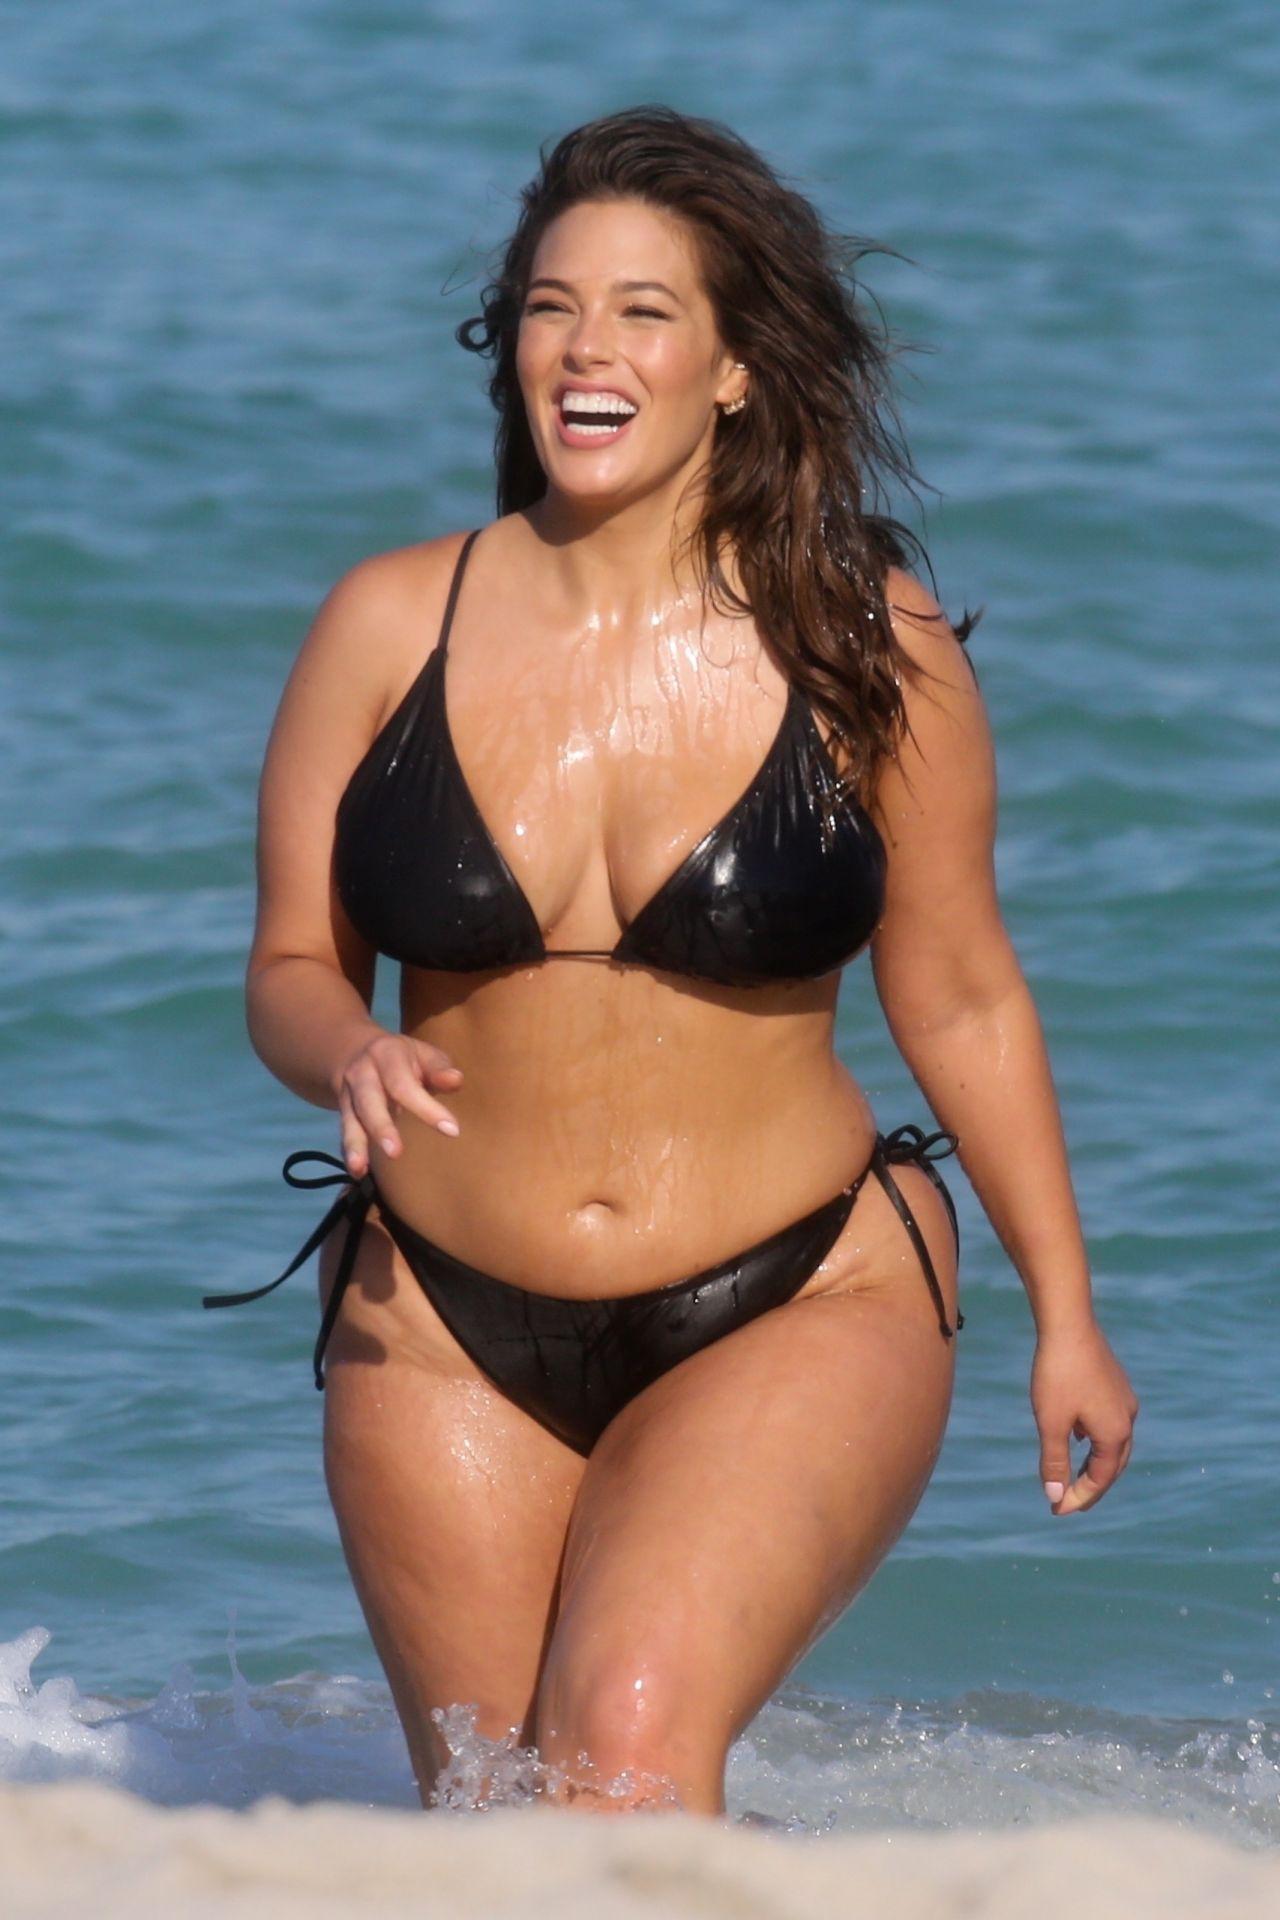 Ashley Graham in a Black Bikini  Photoshoot on the Beach